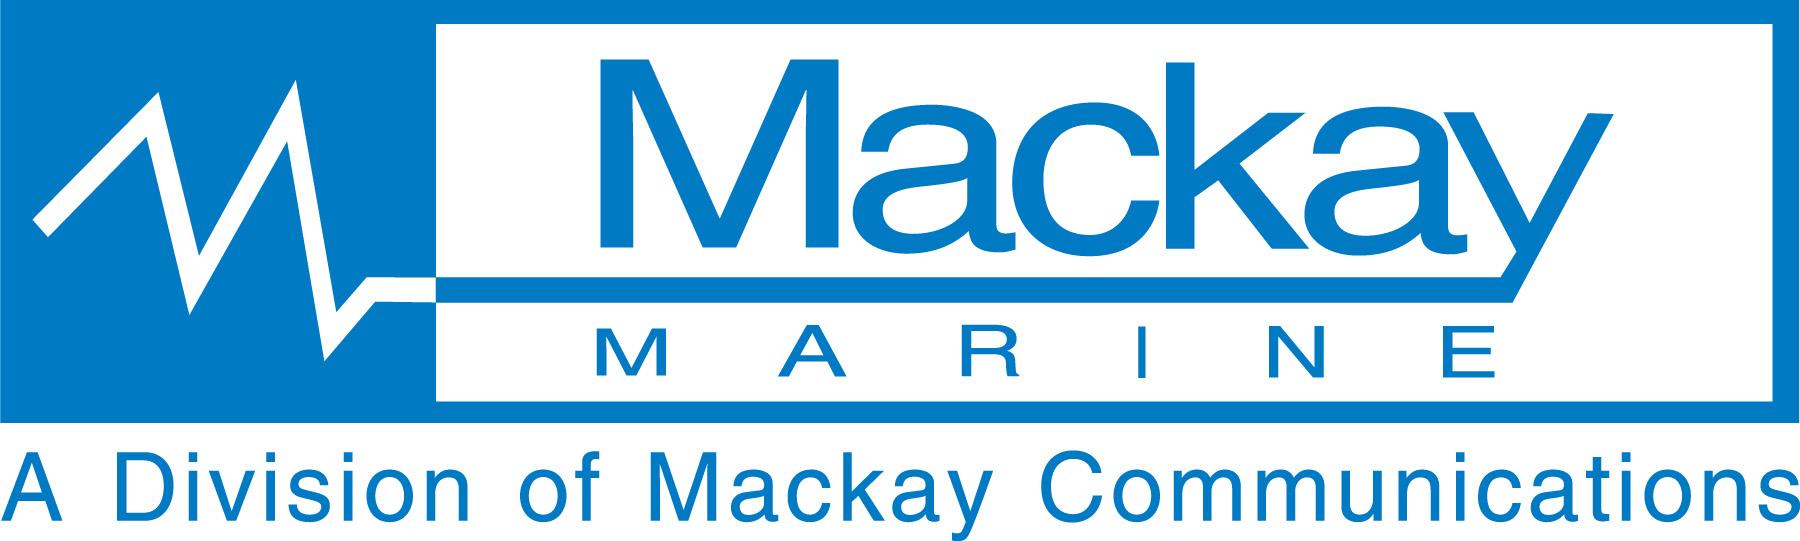 Mackay Marine